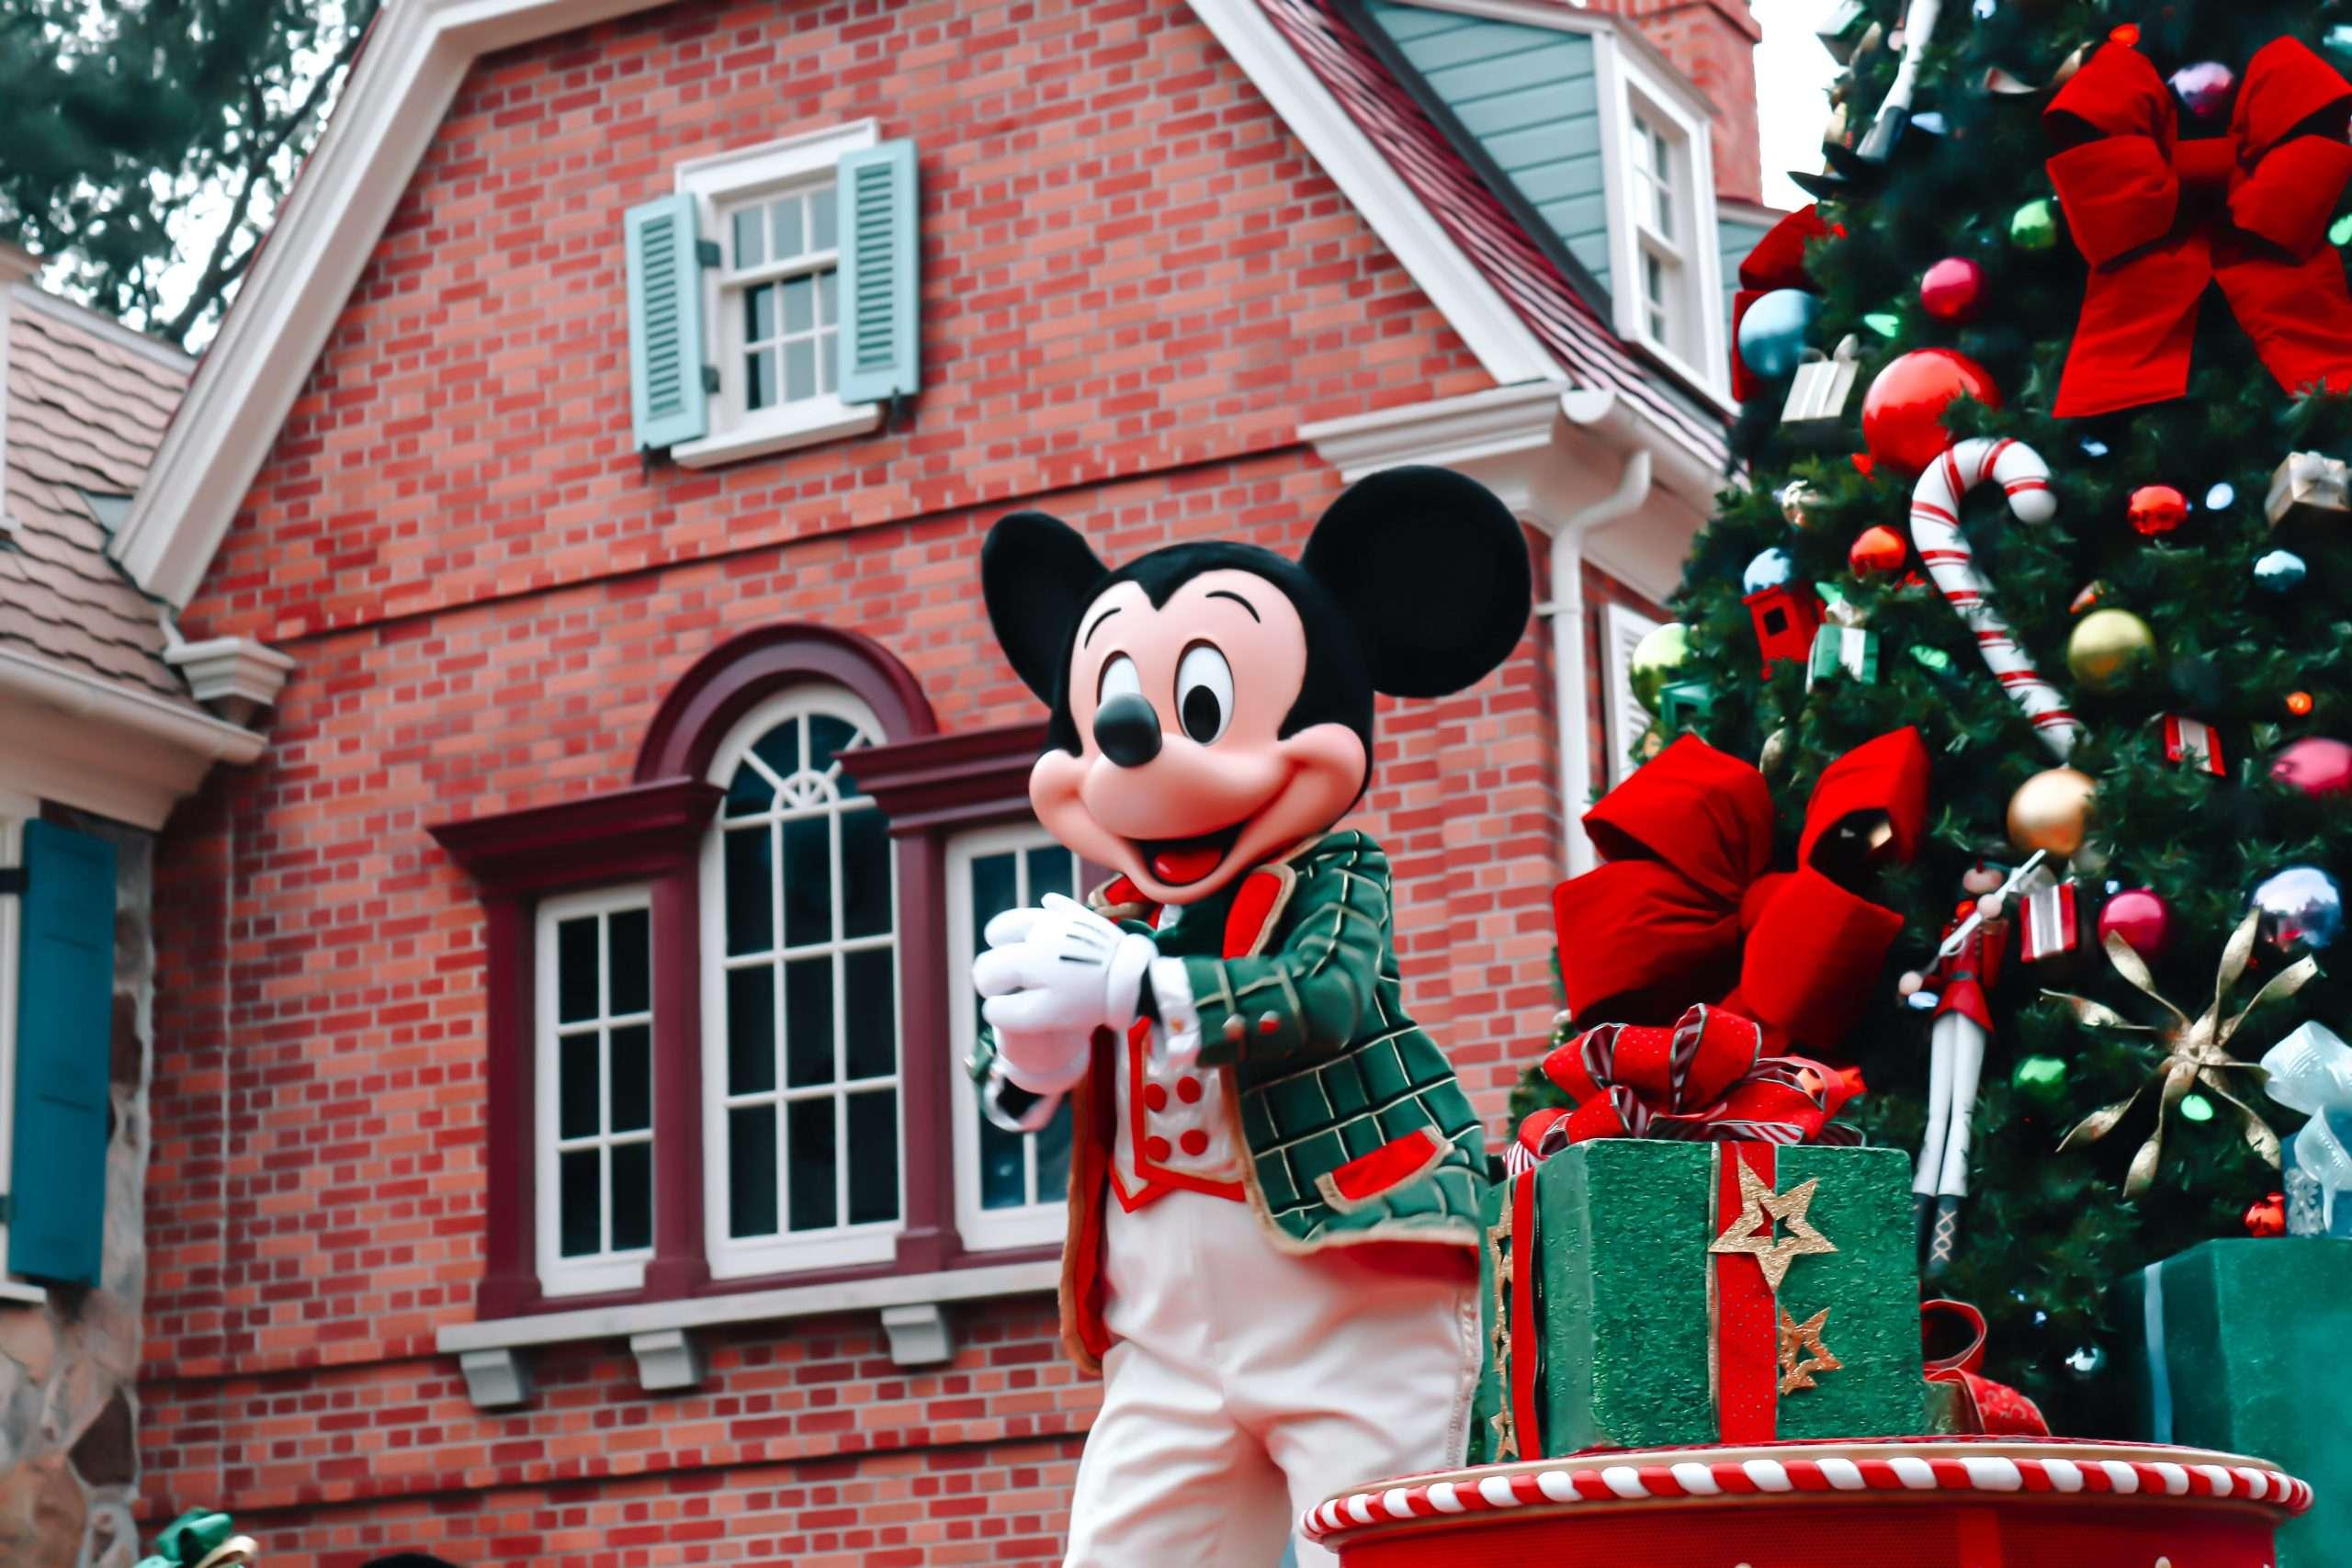 Disney Character Christmas Cavalcades at Disney World